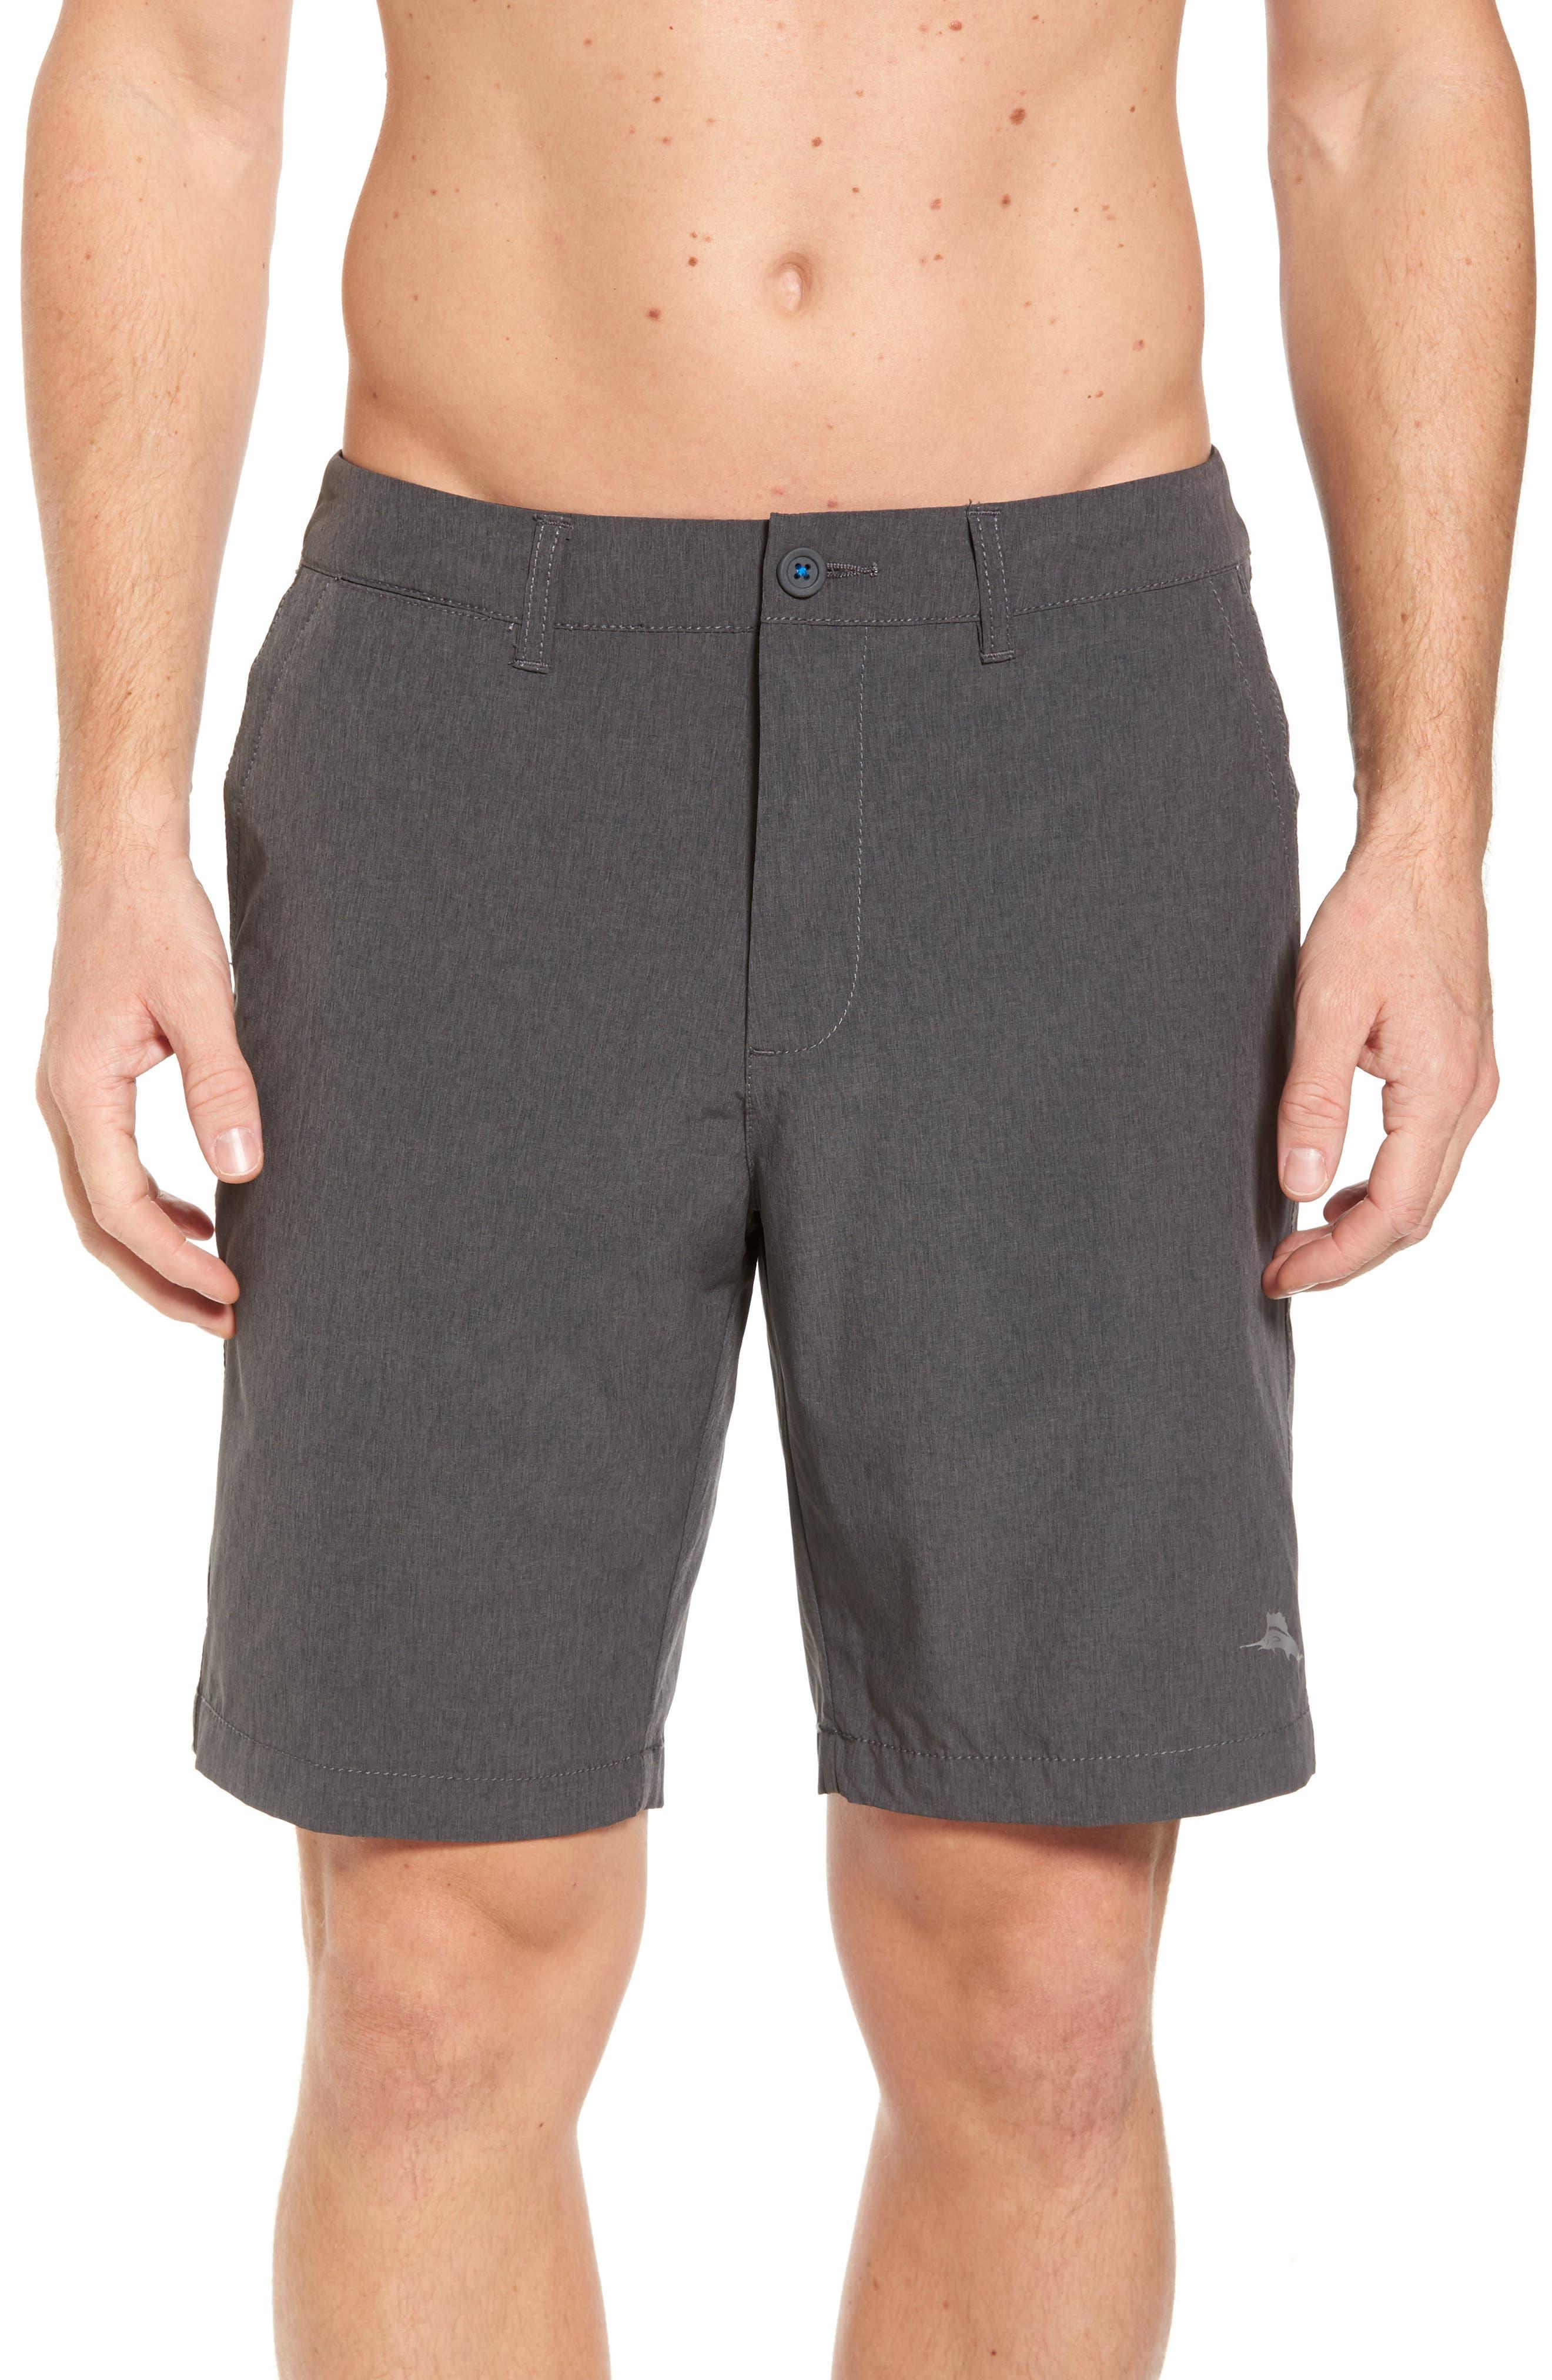 'Cayman Isles' Hybrid Swim Shorts,                         Main,                         color, 002